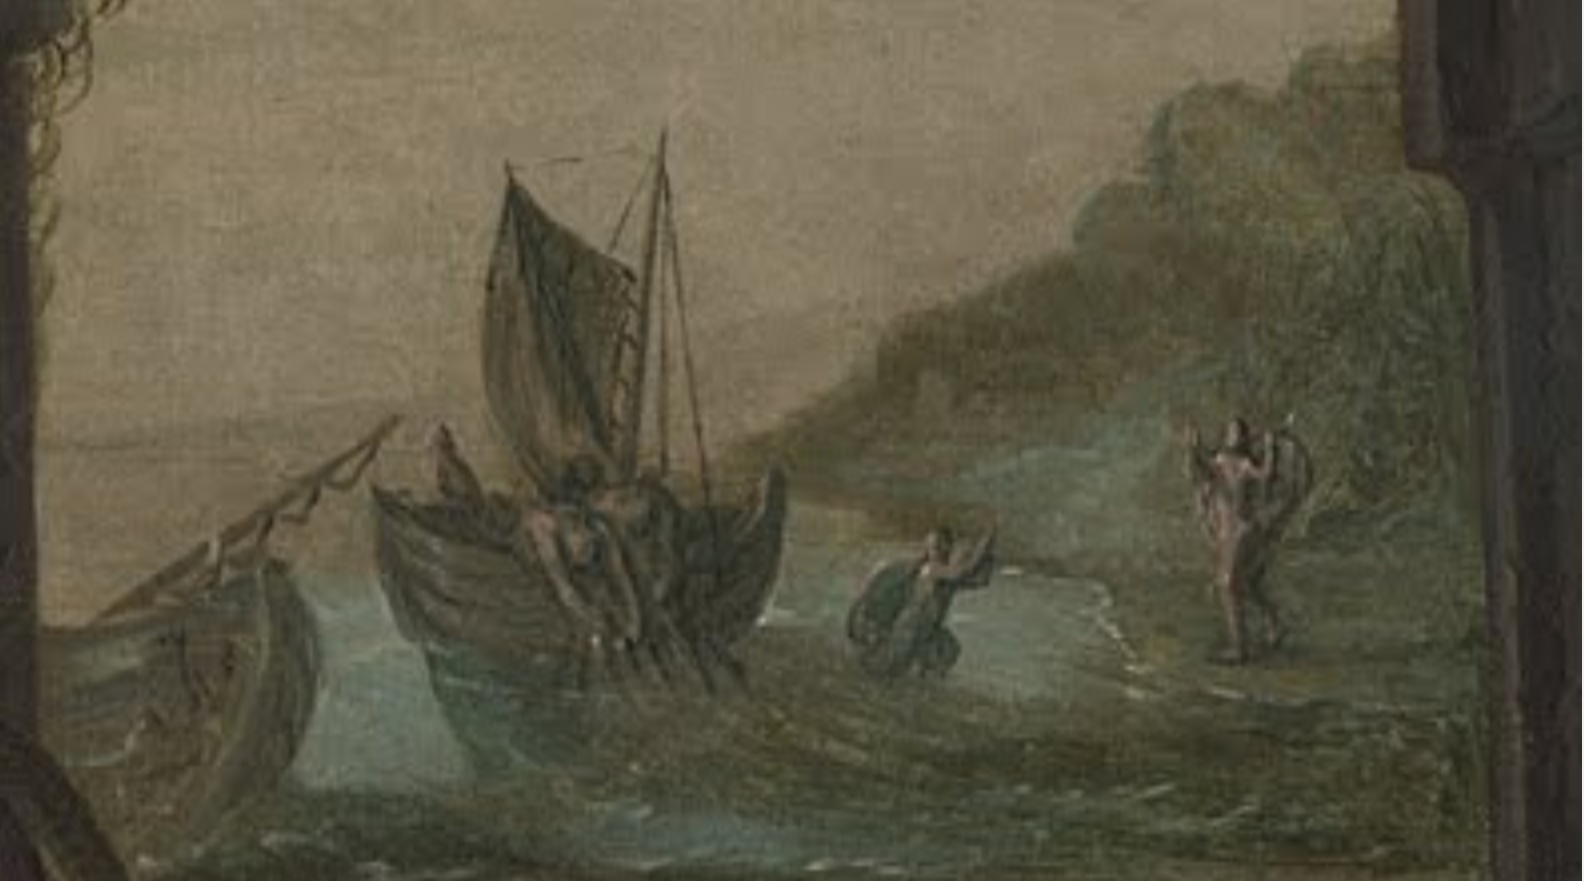 Joachim Beuckelaer Four Elements 1569 painting Water background detail Jesus walks on the sea.jpg